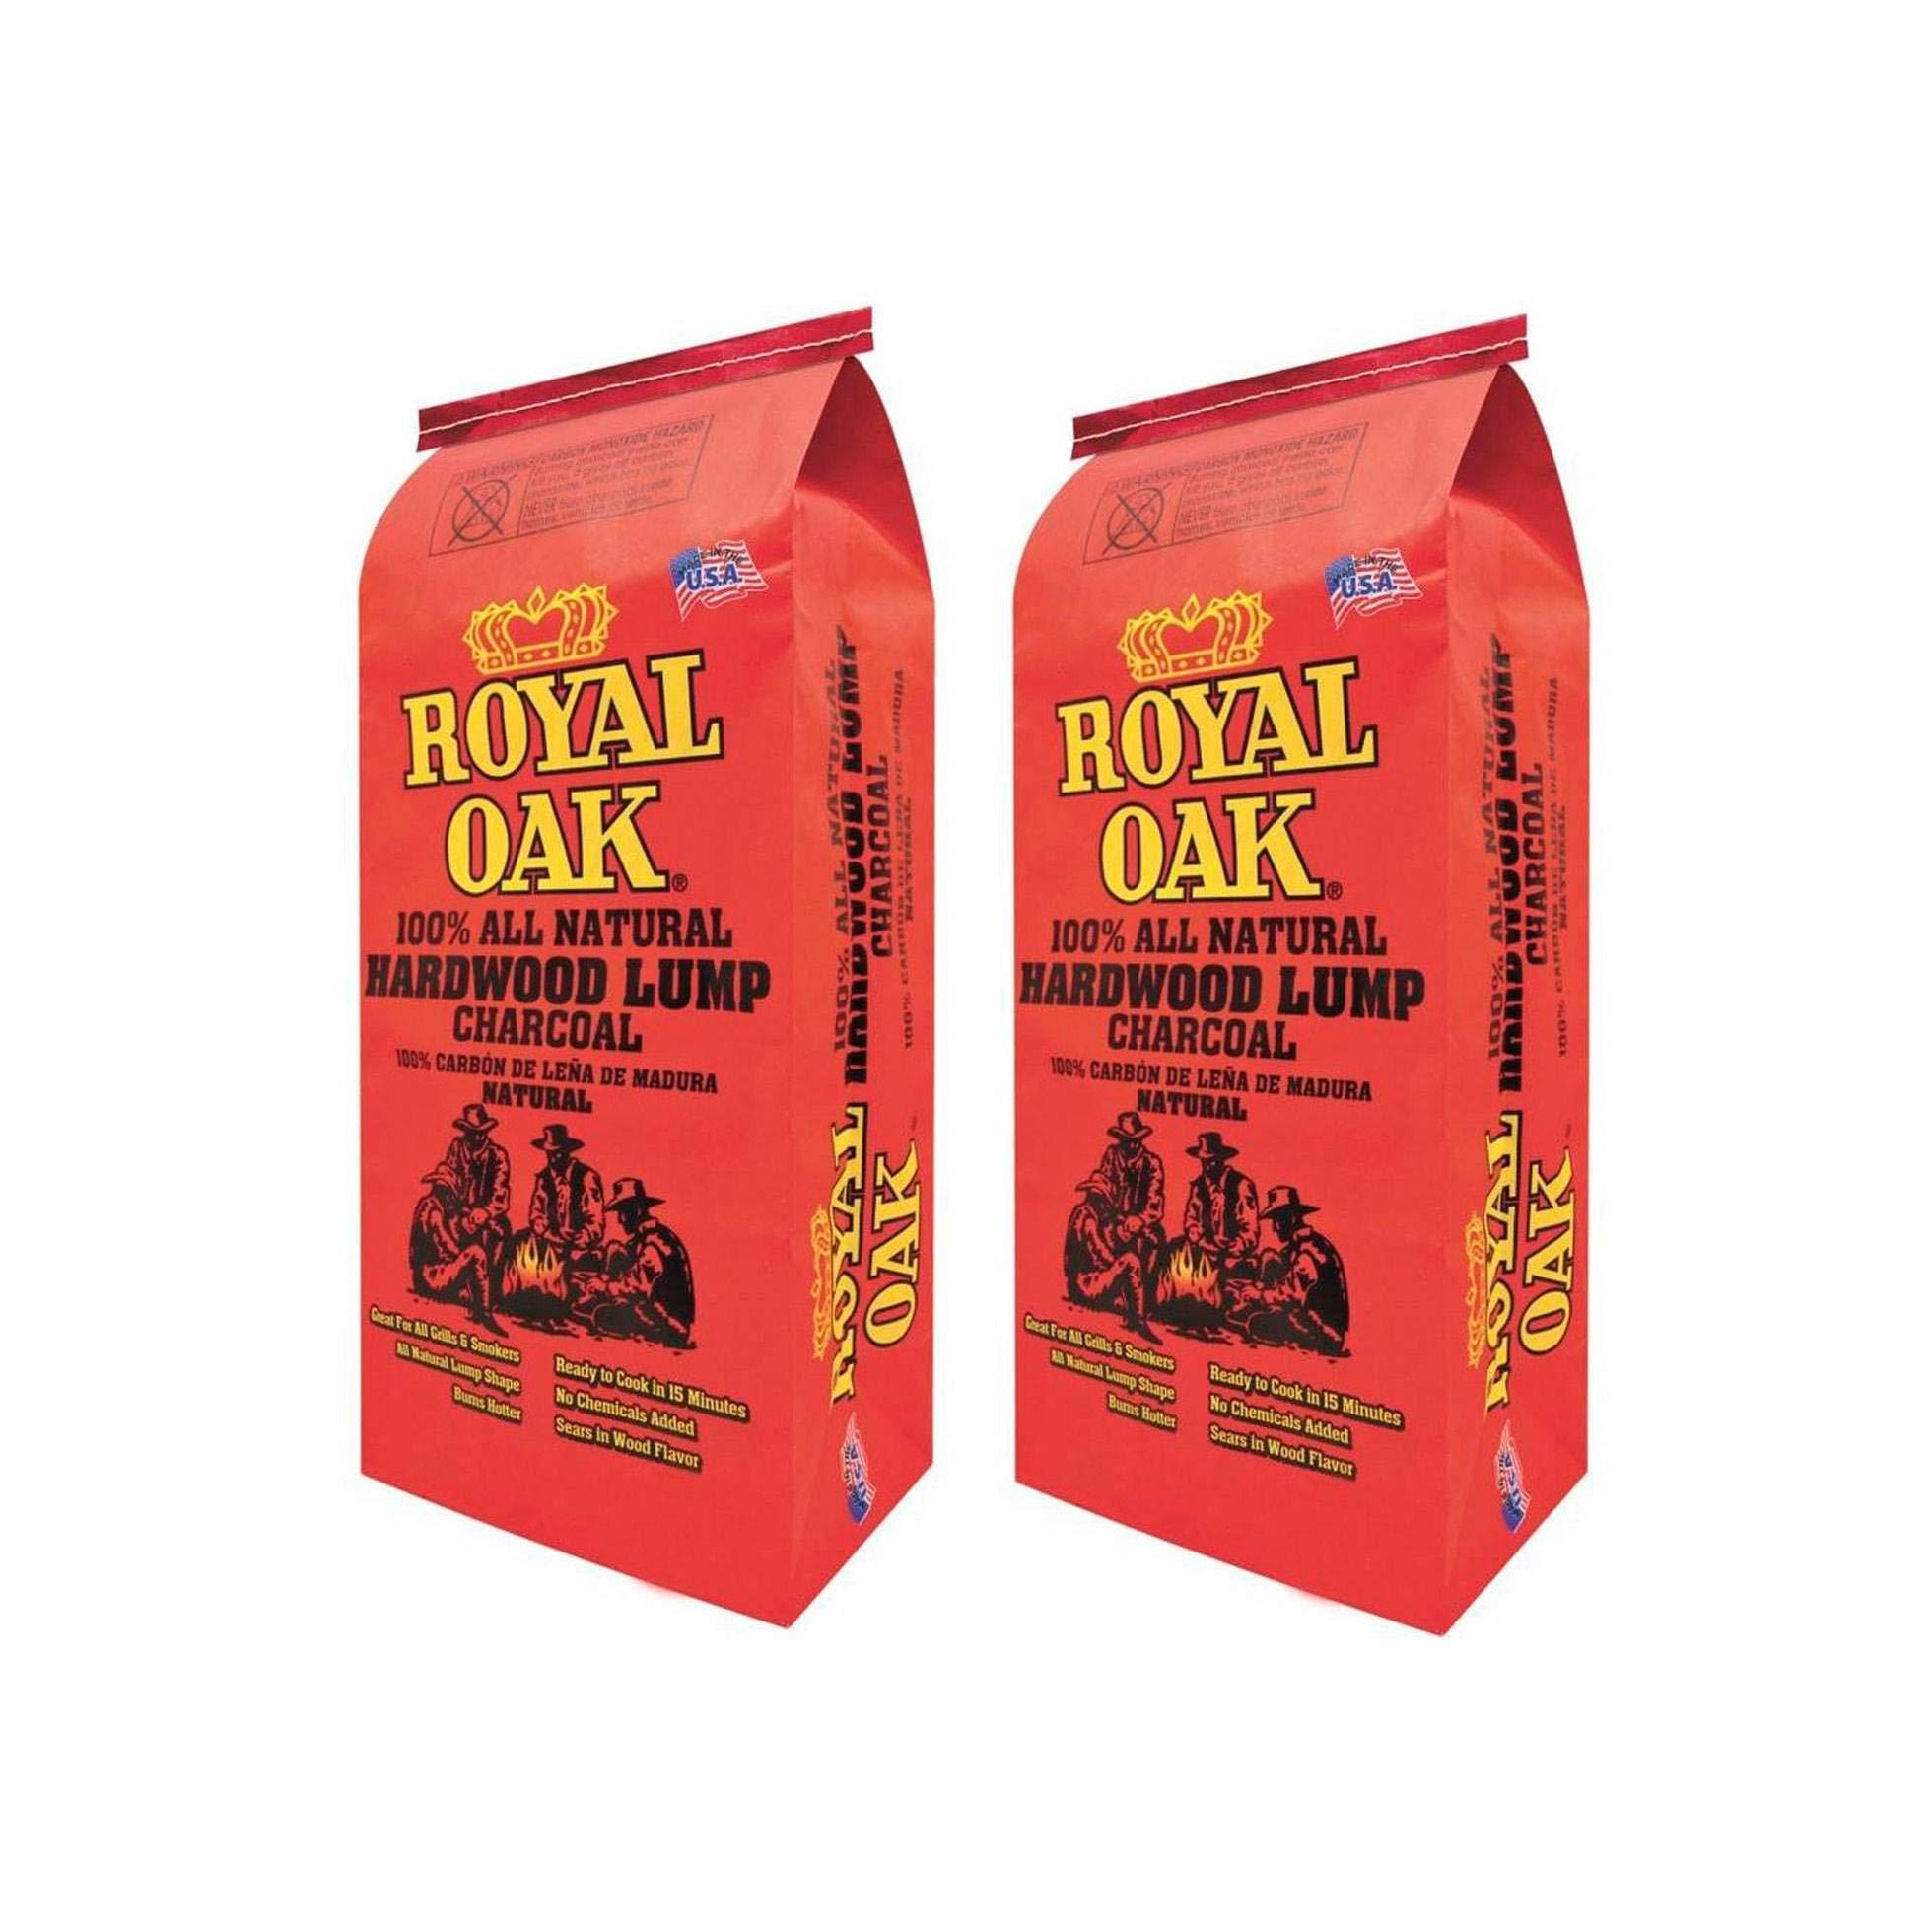 Royal Oak BBQ All Natural Premium 8 Pound Bag Lump Charcoal Starter (2 Pack) by Royal Oak